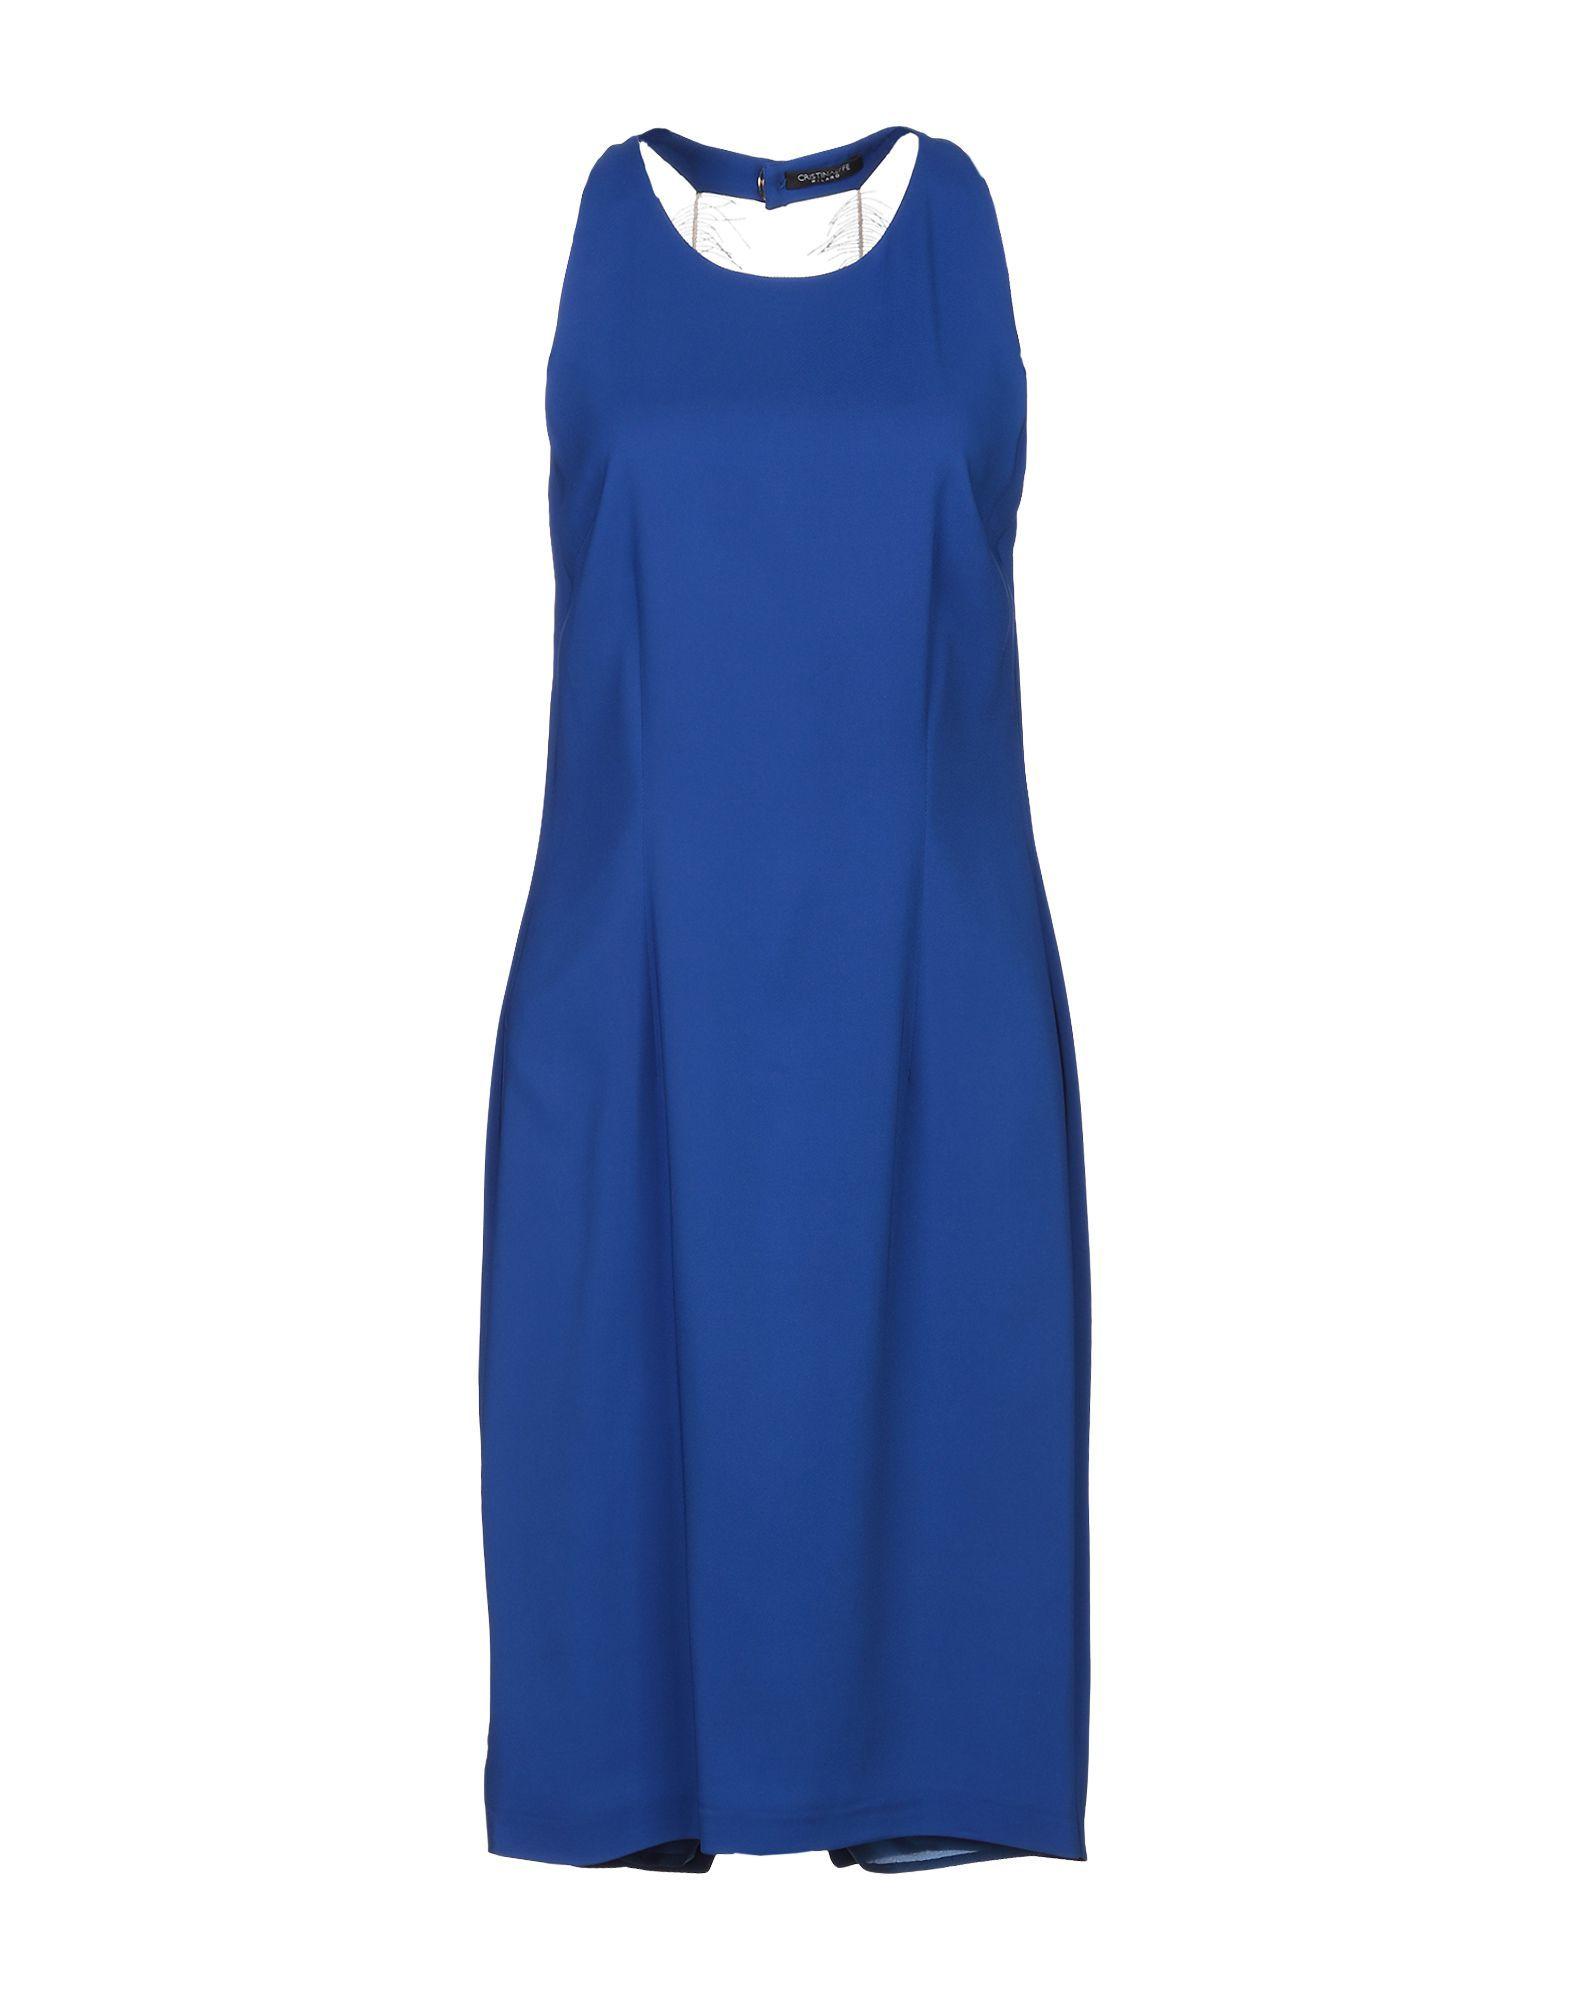 Cristinaeffe Bright Blue Crepe Sleeveless Dress